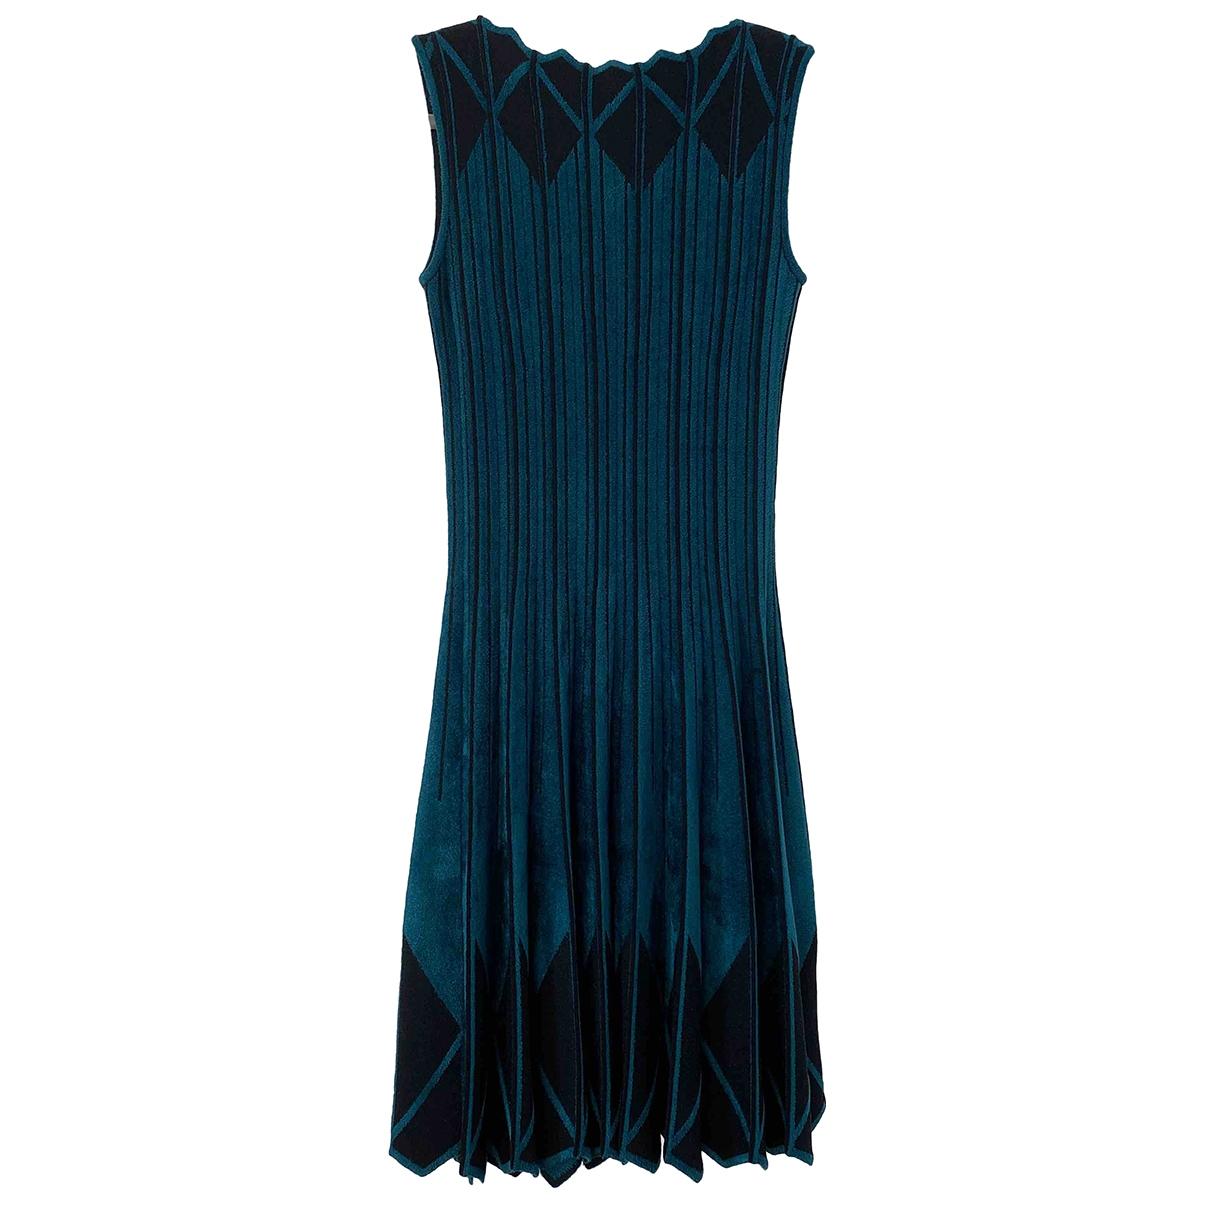 Antonio Valenti \N Multicolour dress for Women 42 IT